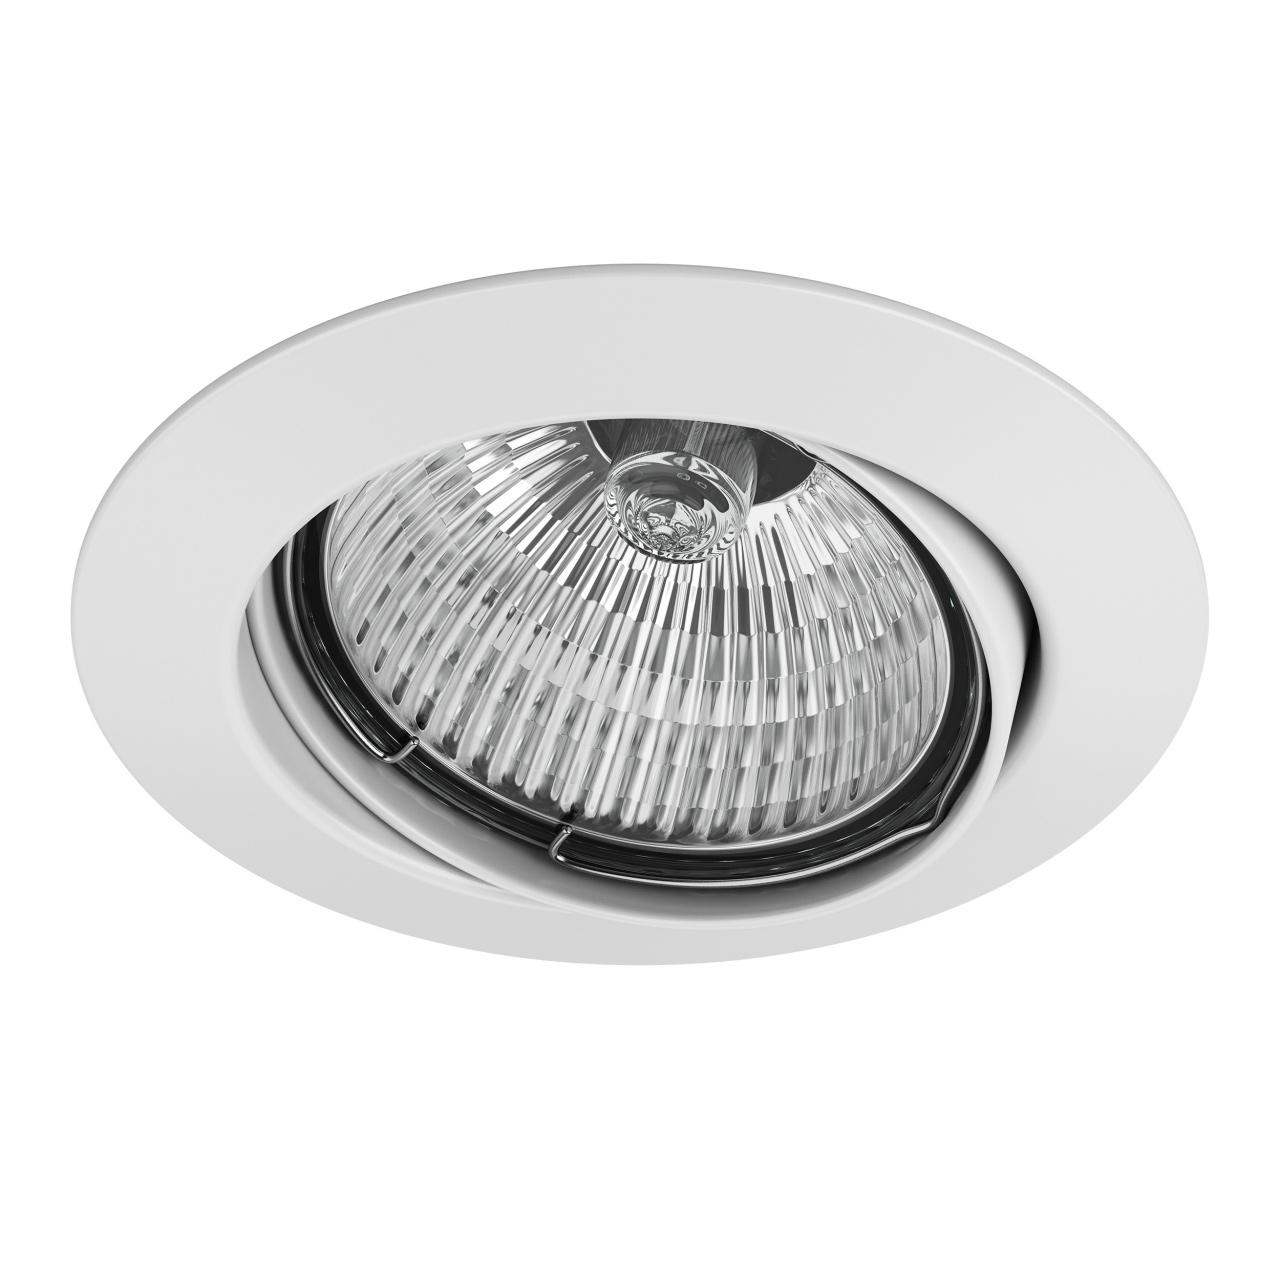 Светильник lega HI ADJ MR16 / HP16 белый Lightstar 011020